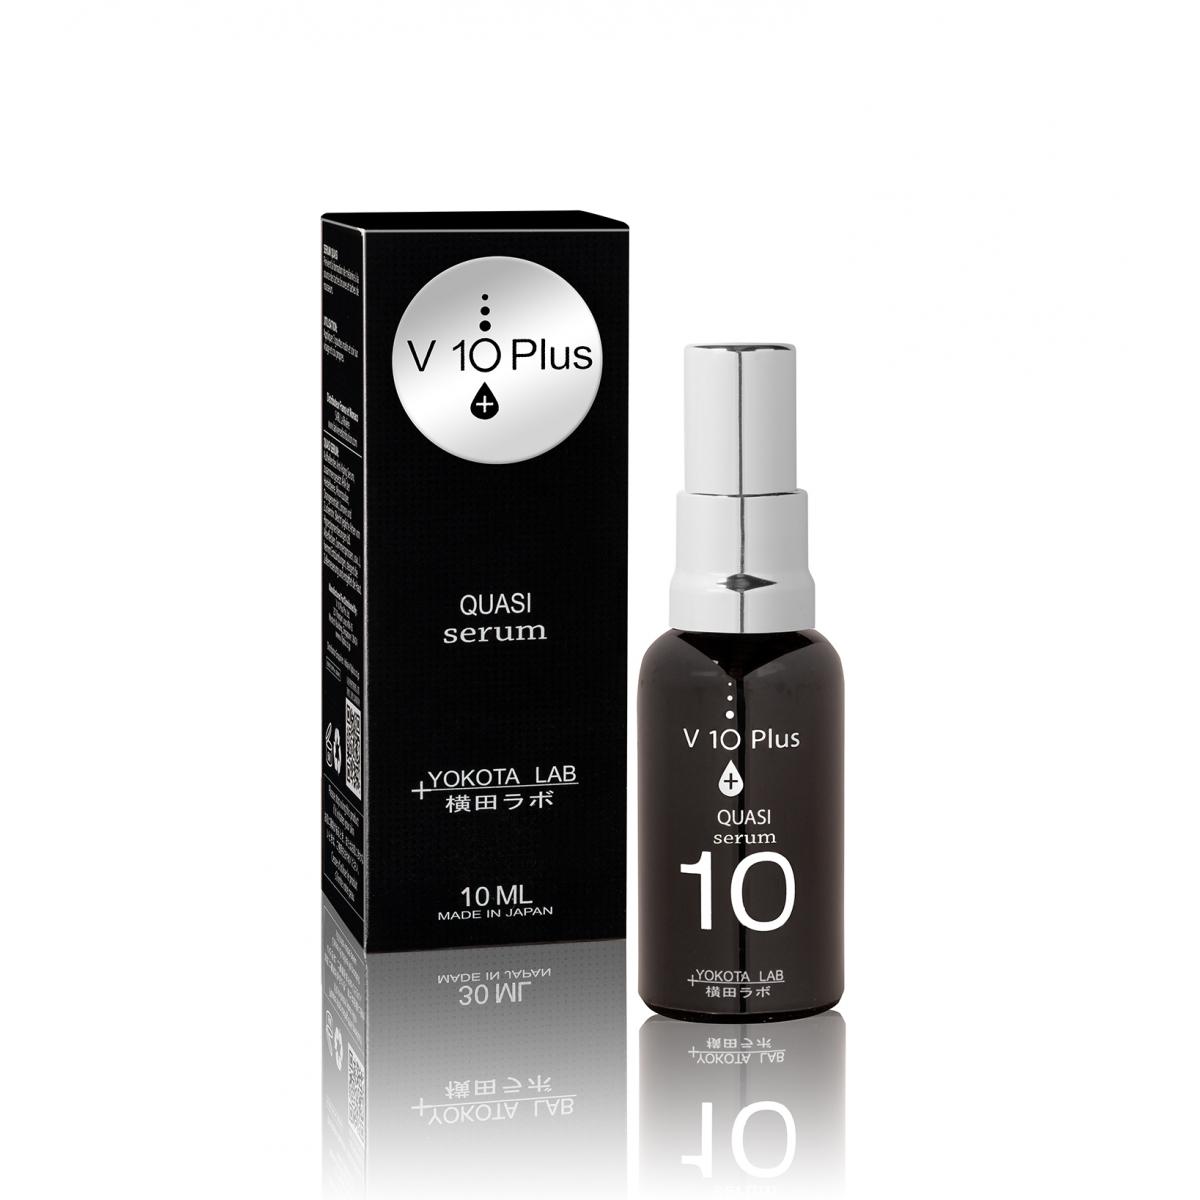 SOIN DU VISAGE - QUASI SERUM V10+ (10 ml)